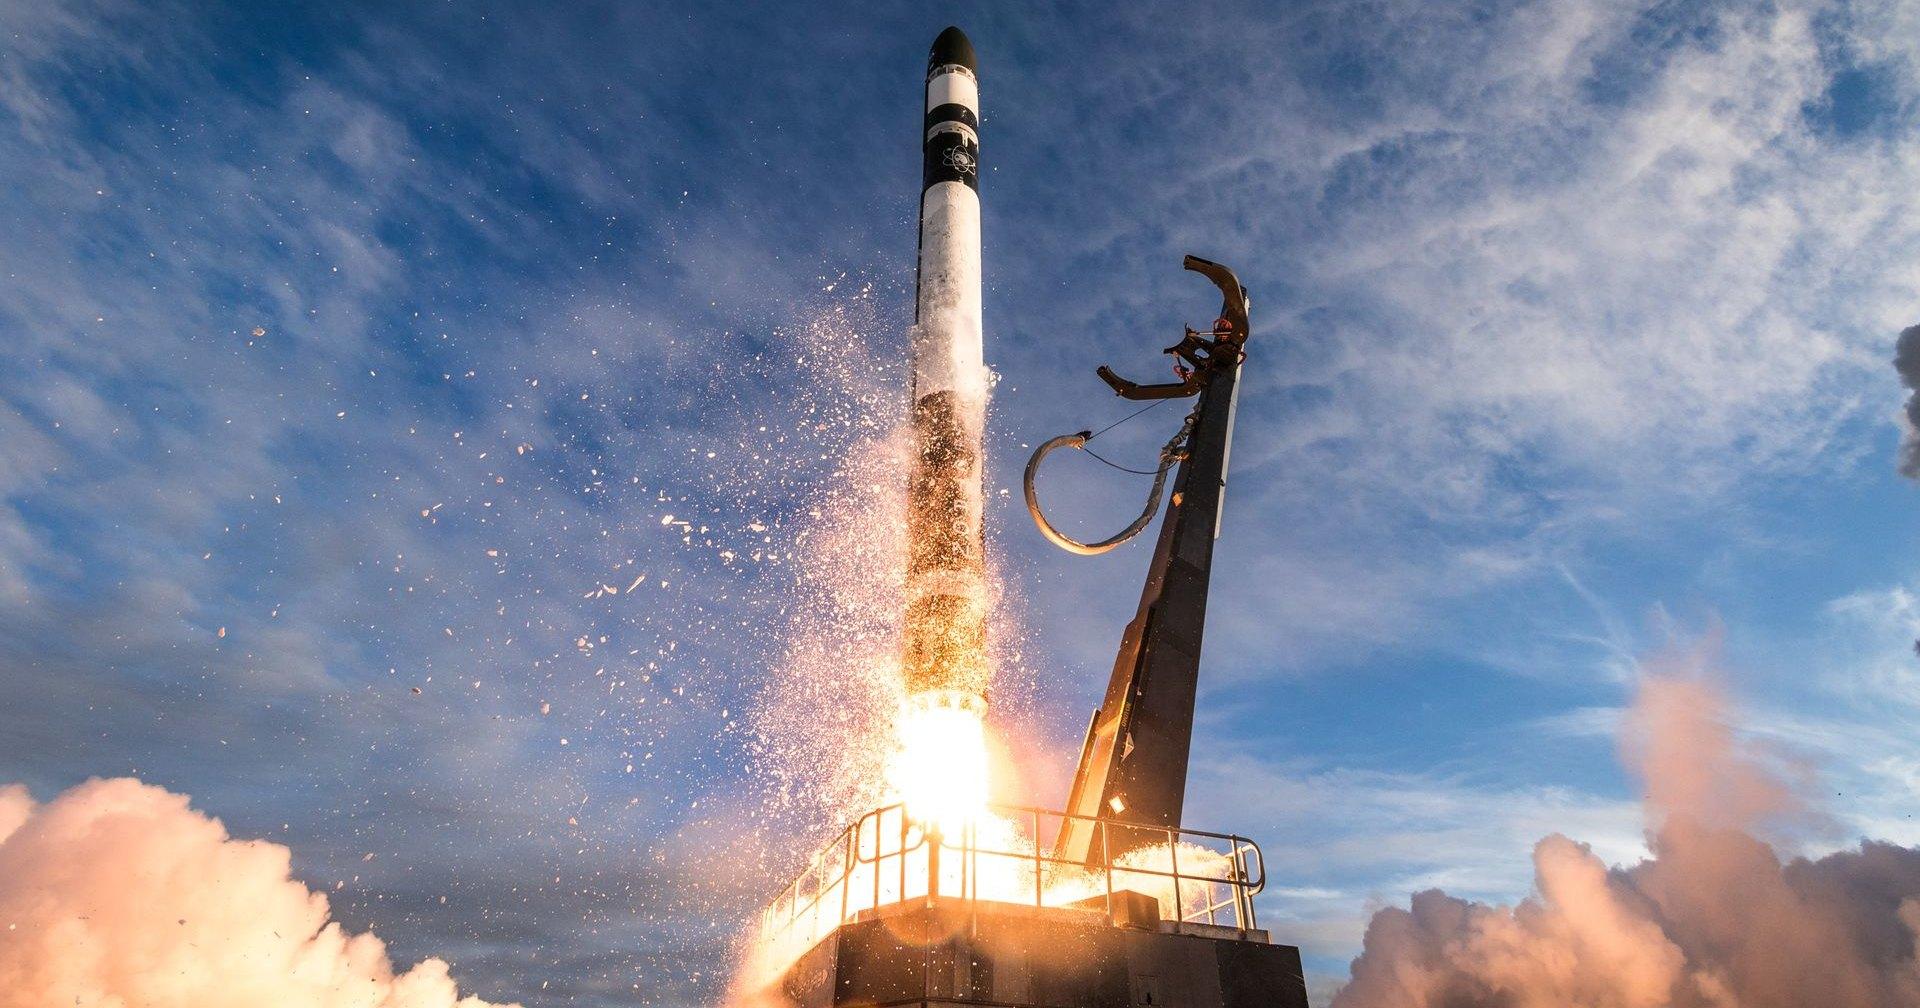 Прямая трансляция запуска Rocketlab Electron